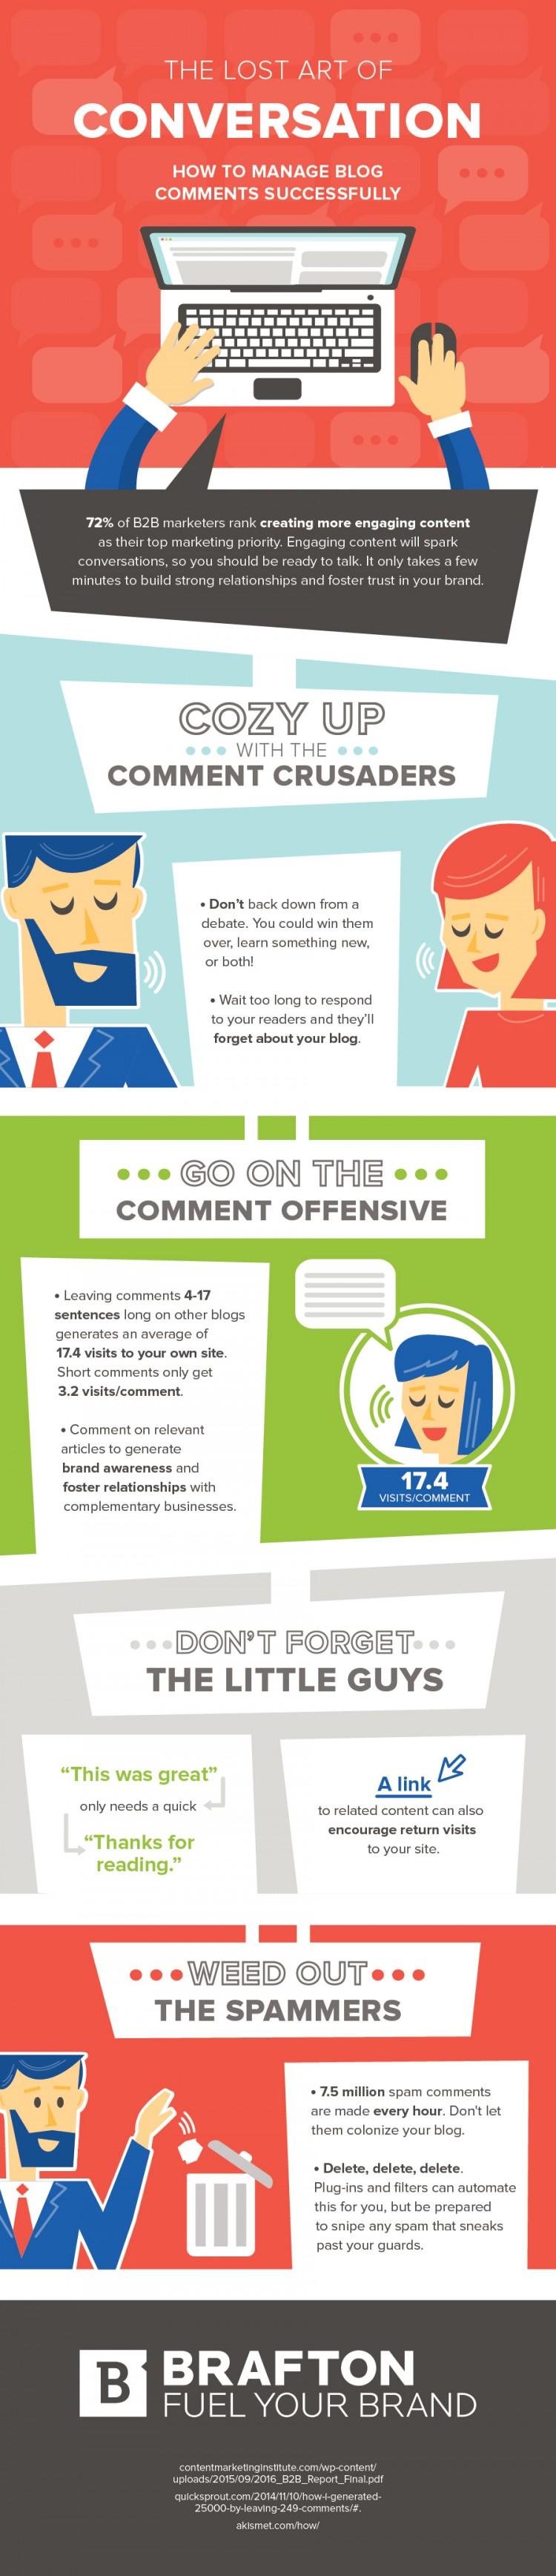 Brafton's Infographic: